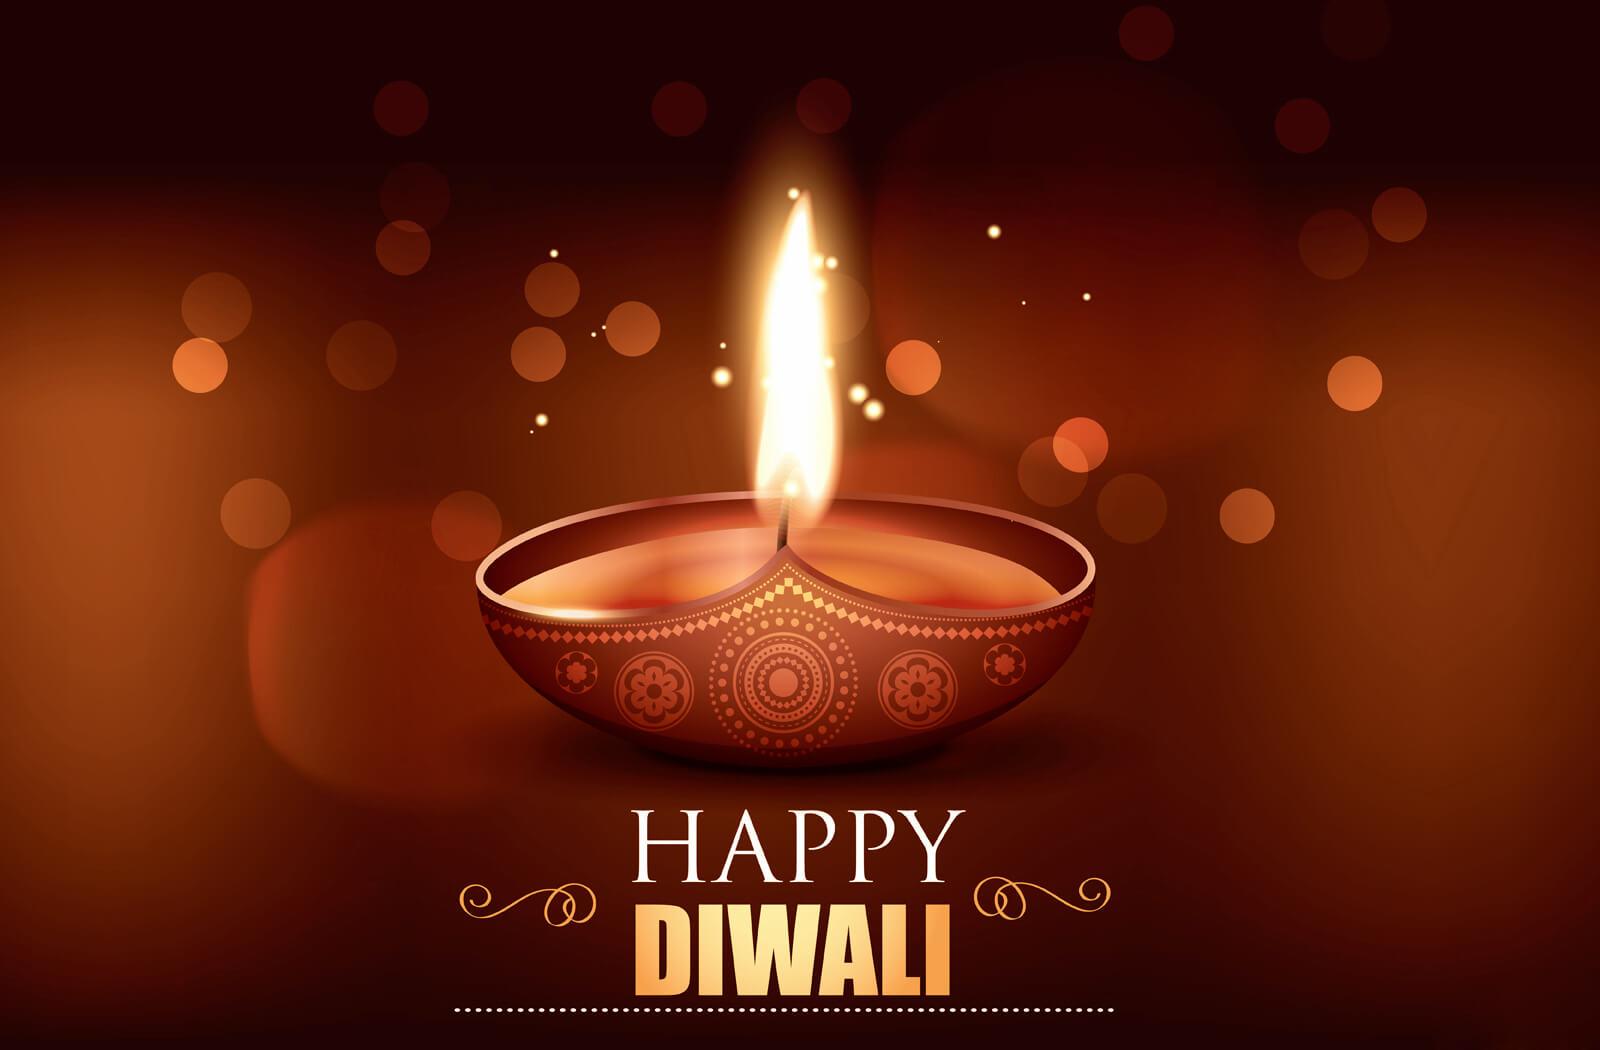 Download-Happy-Diwali-2015-HD-Wallpapers-facebook-mobile-desktop-cgfrog-20